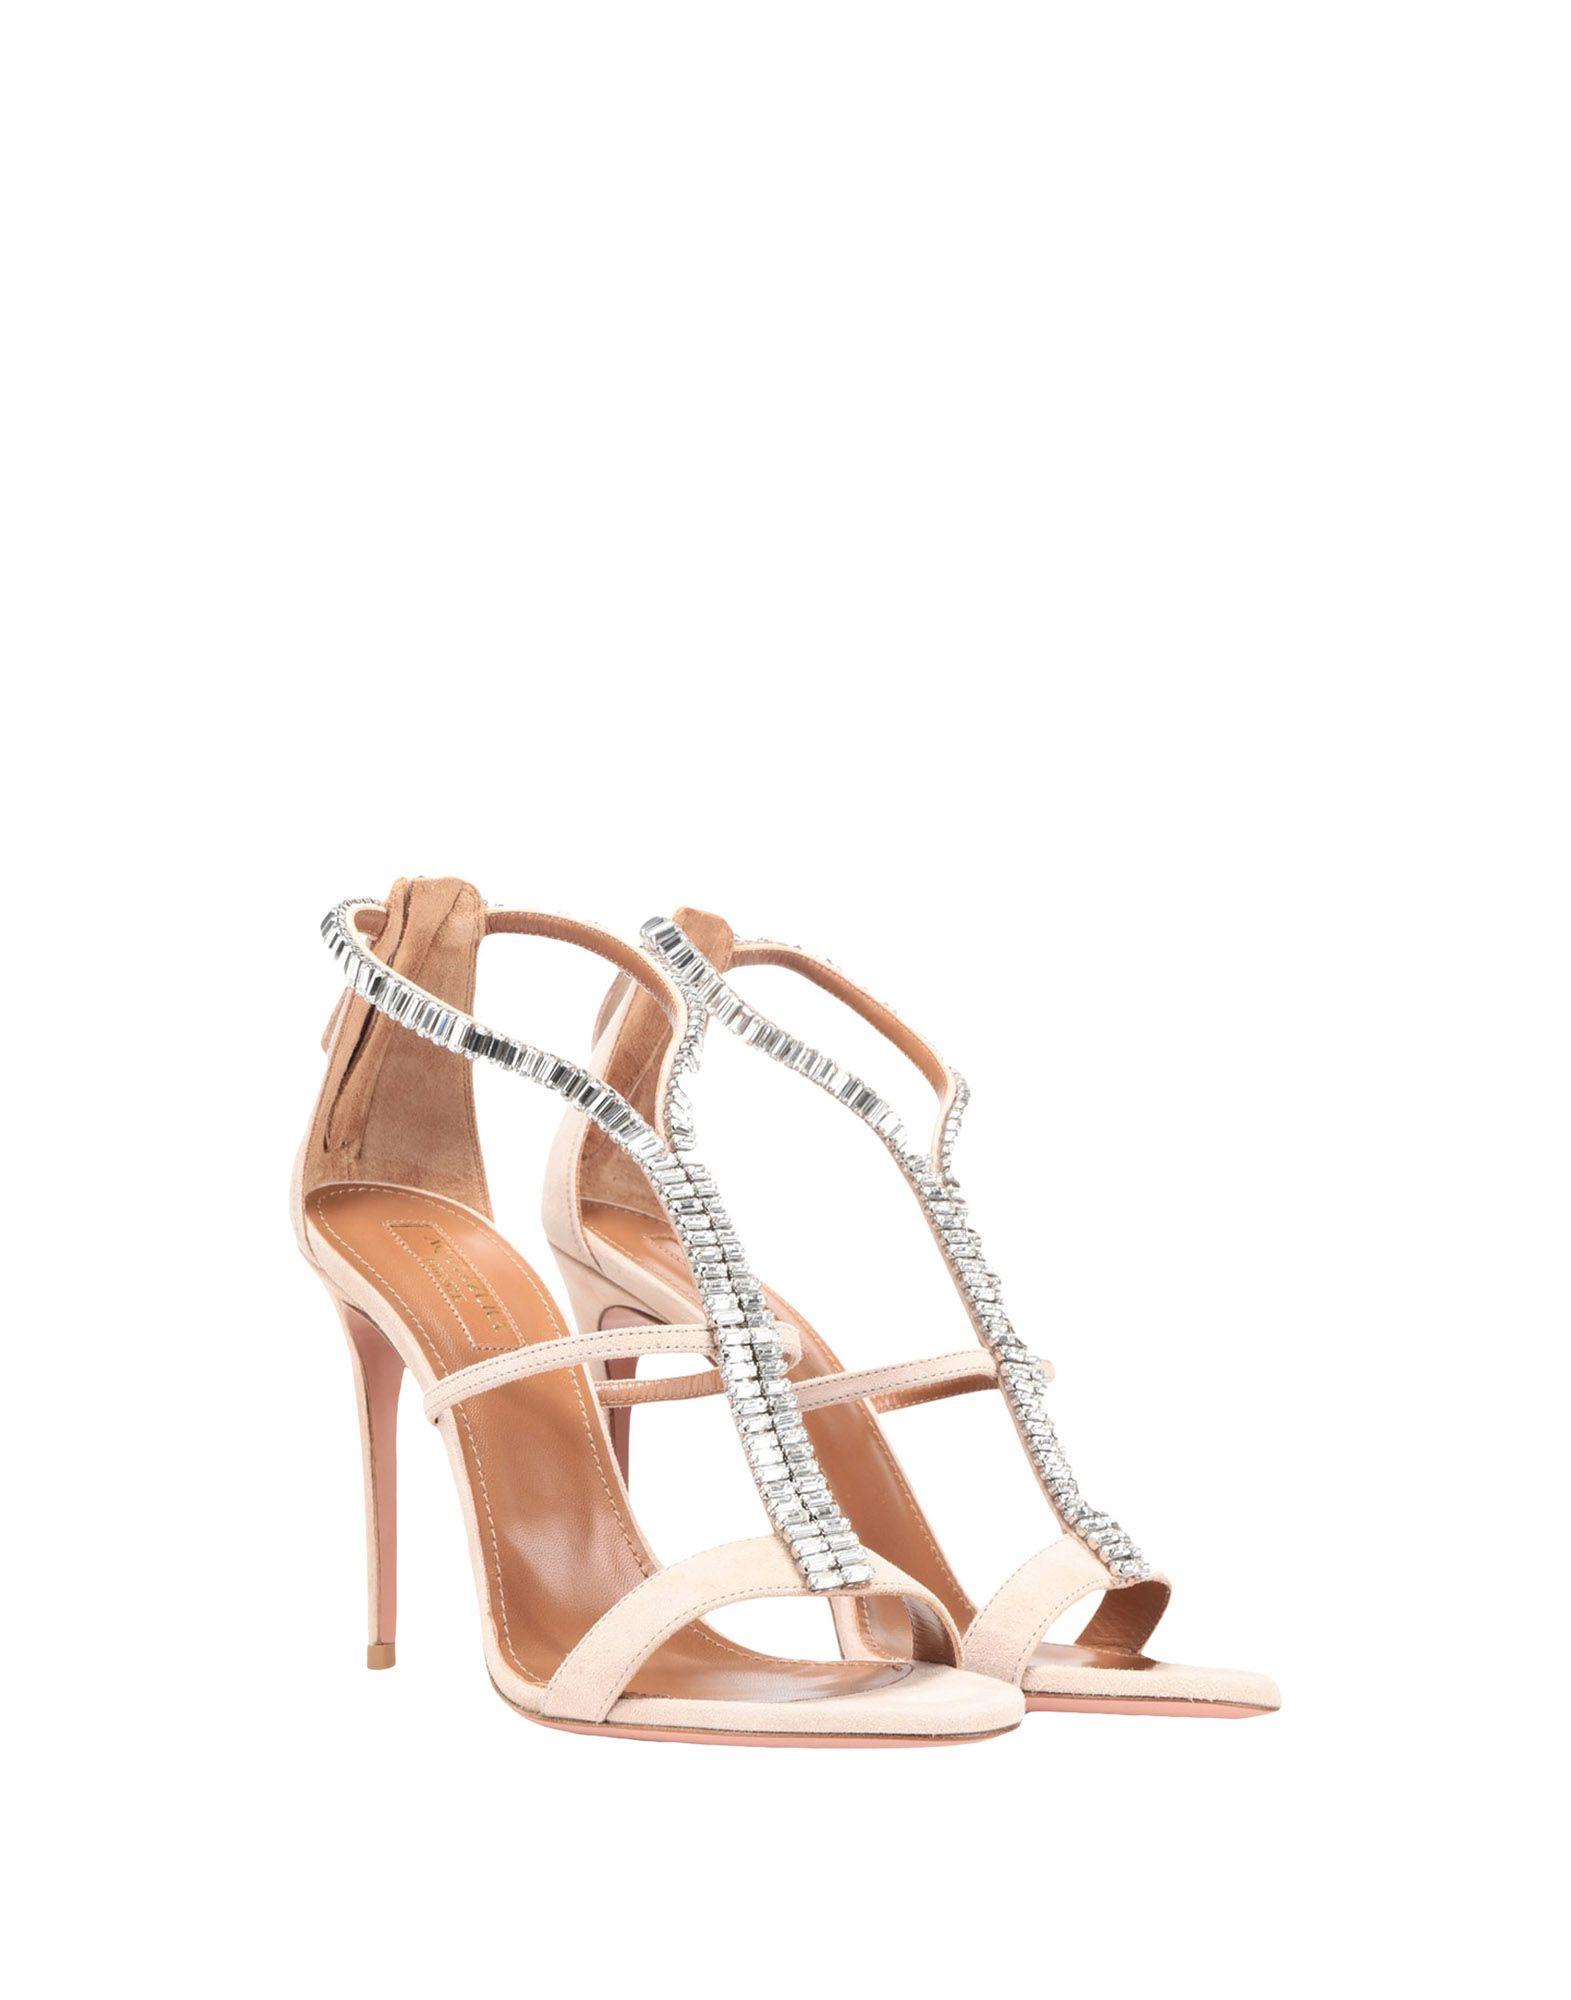 Aquazzura Sandalen Damen  11397758BLGünstige gut aussehende Schuhe